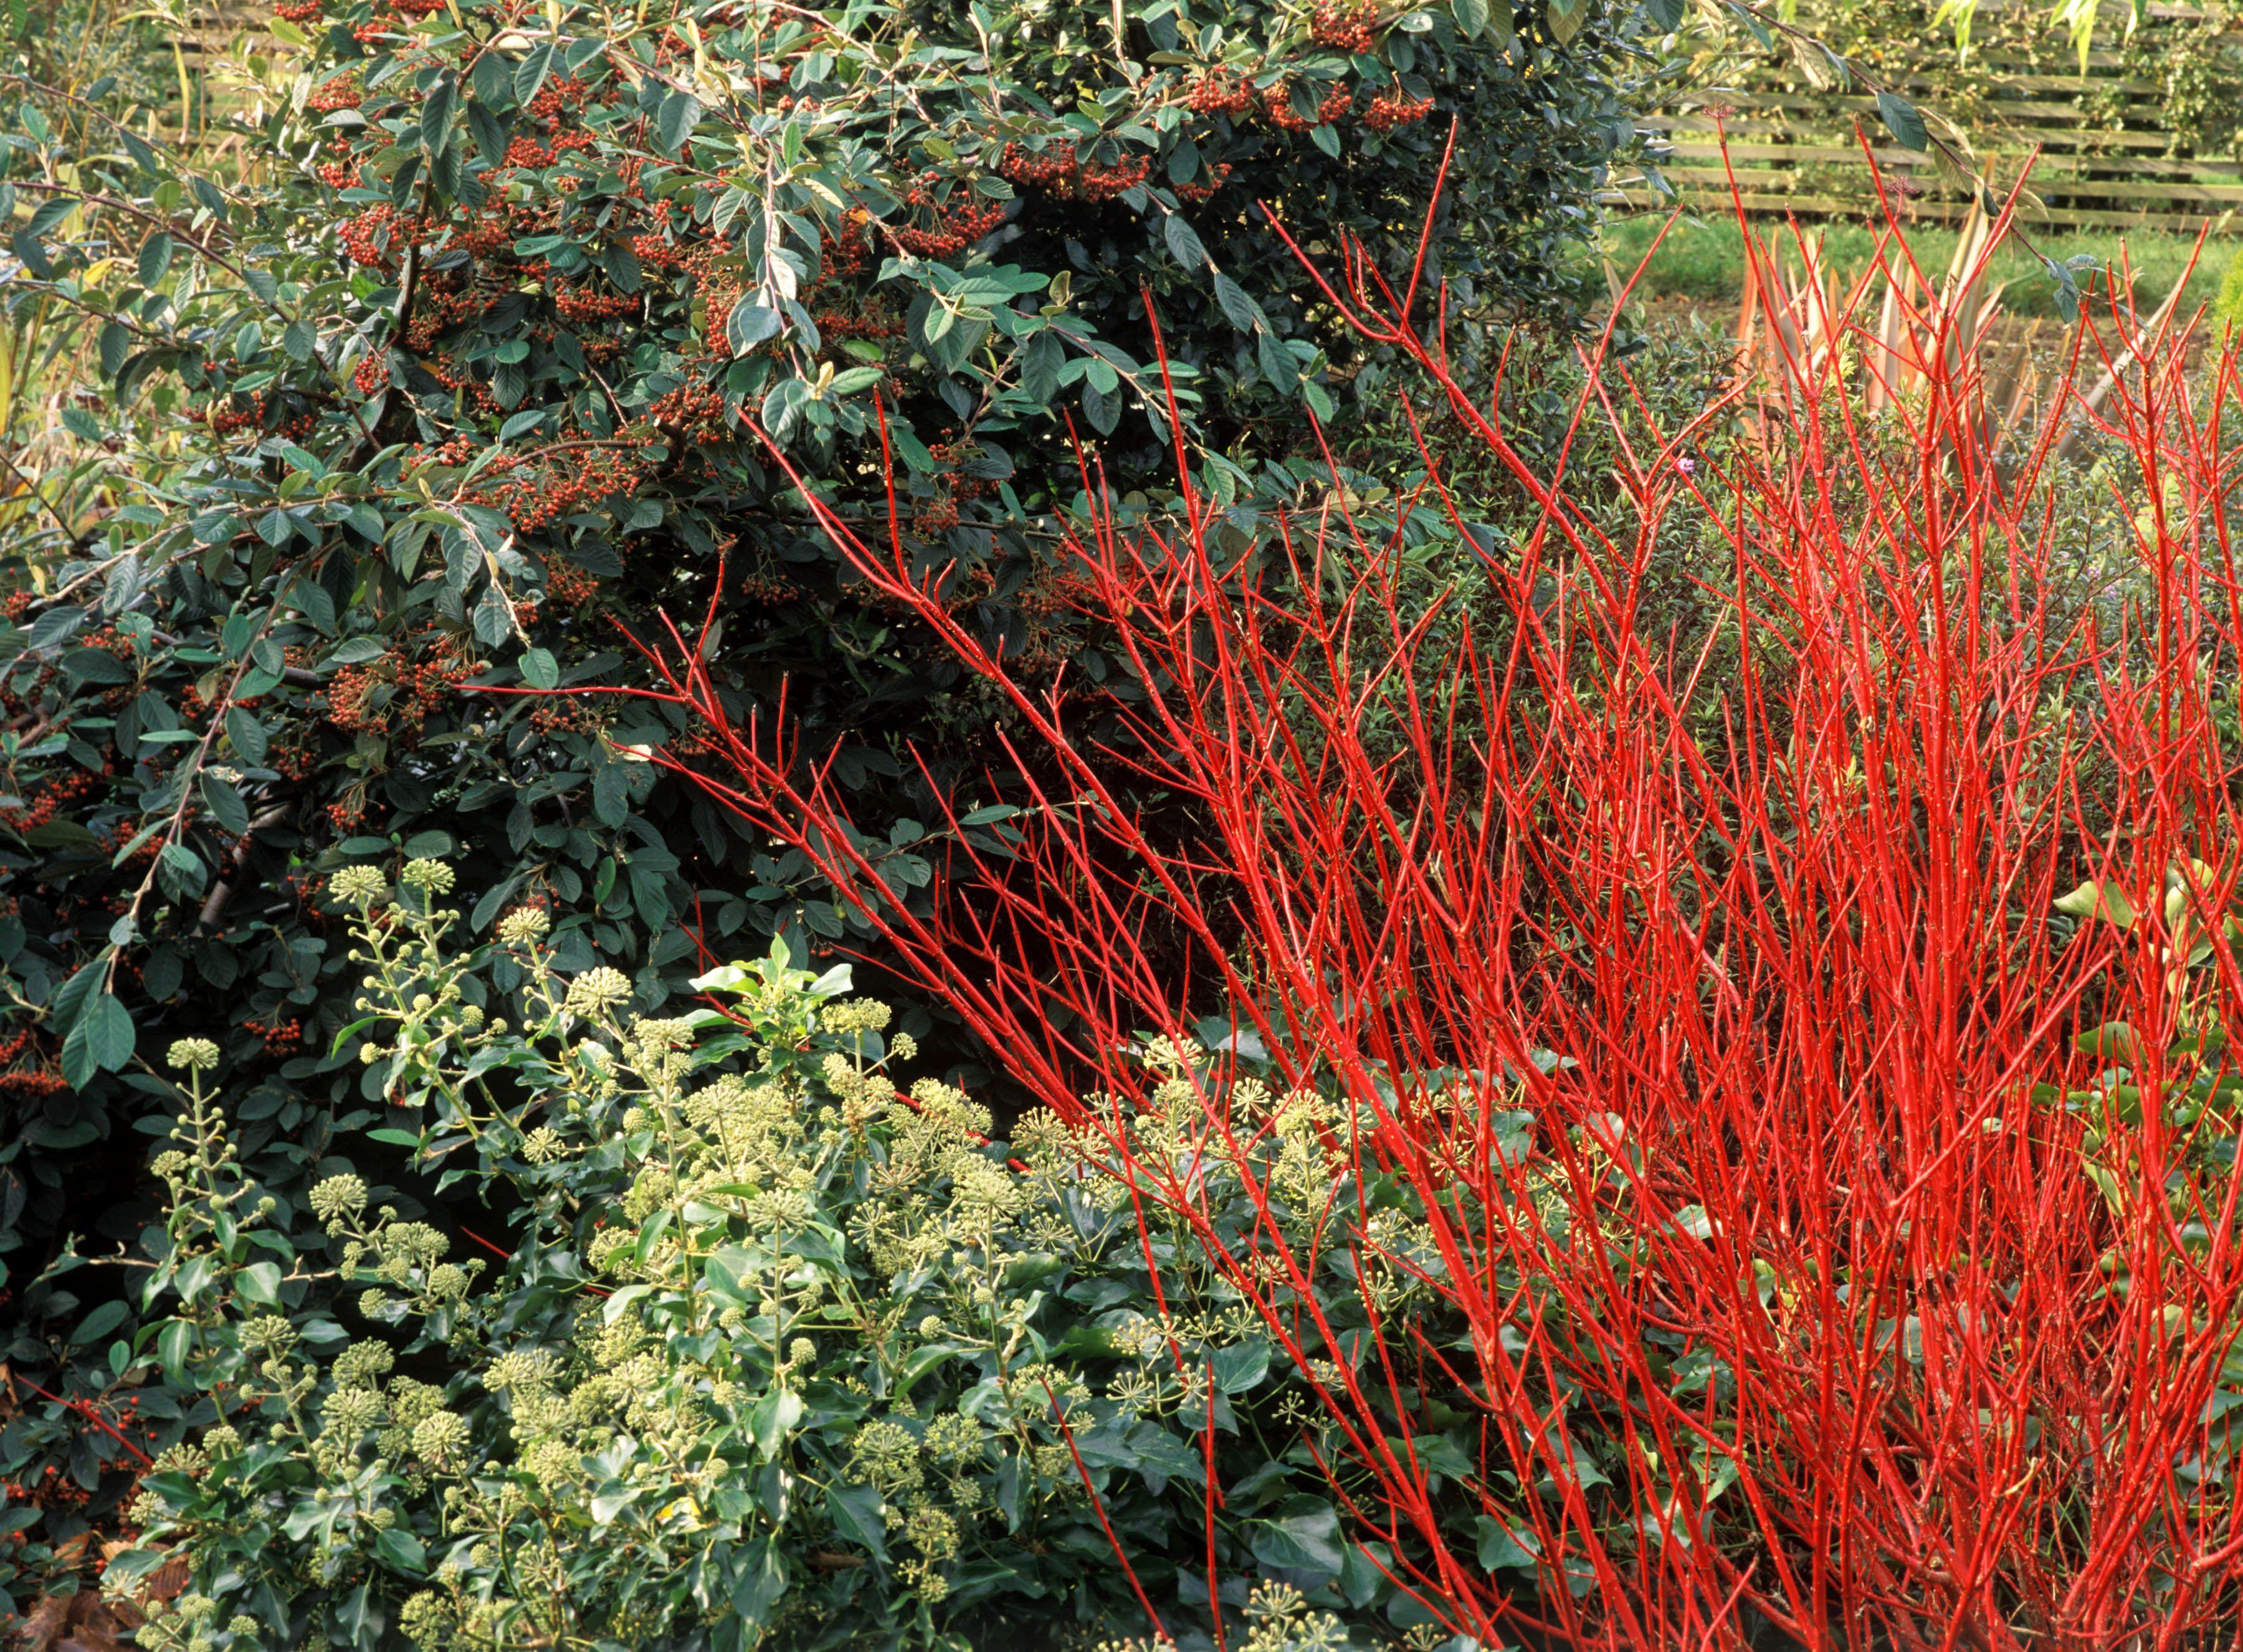 Red dogwood Getty 588a56d05f9b5874ee c